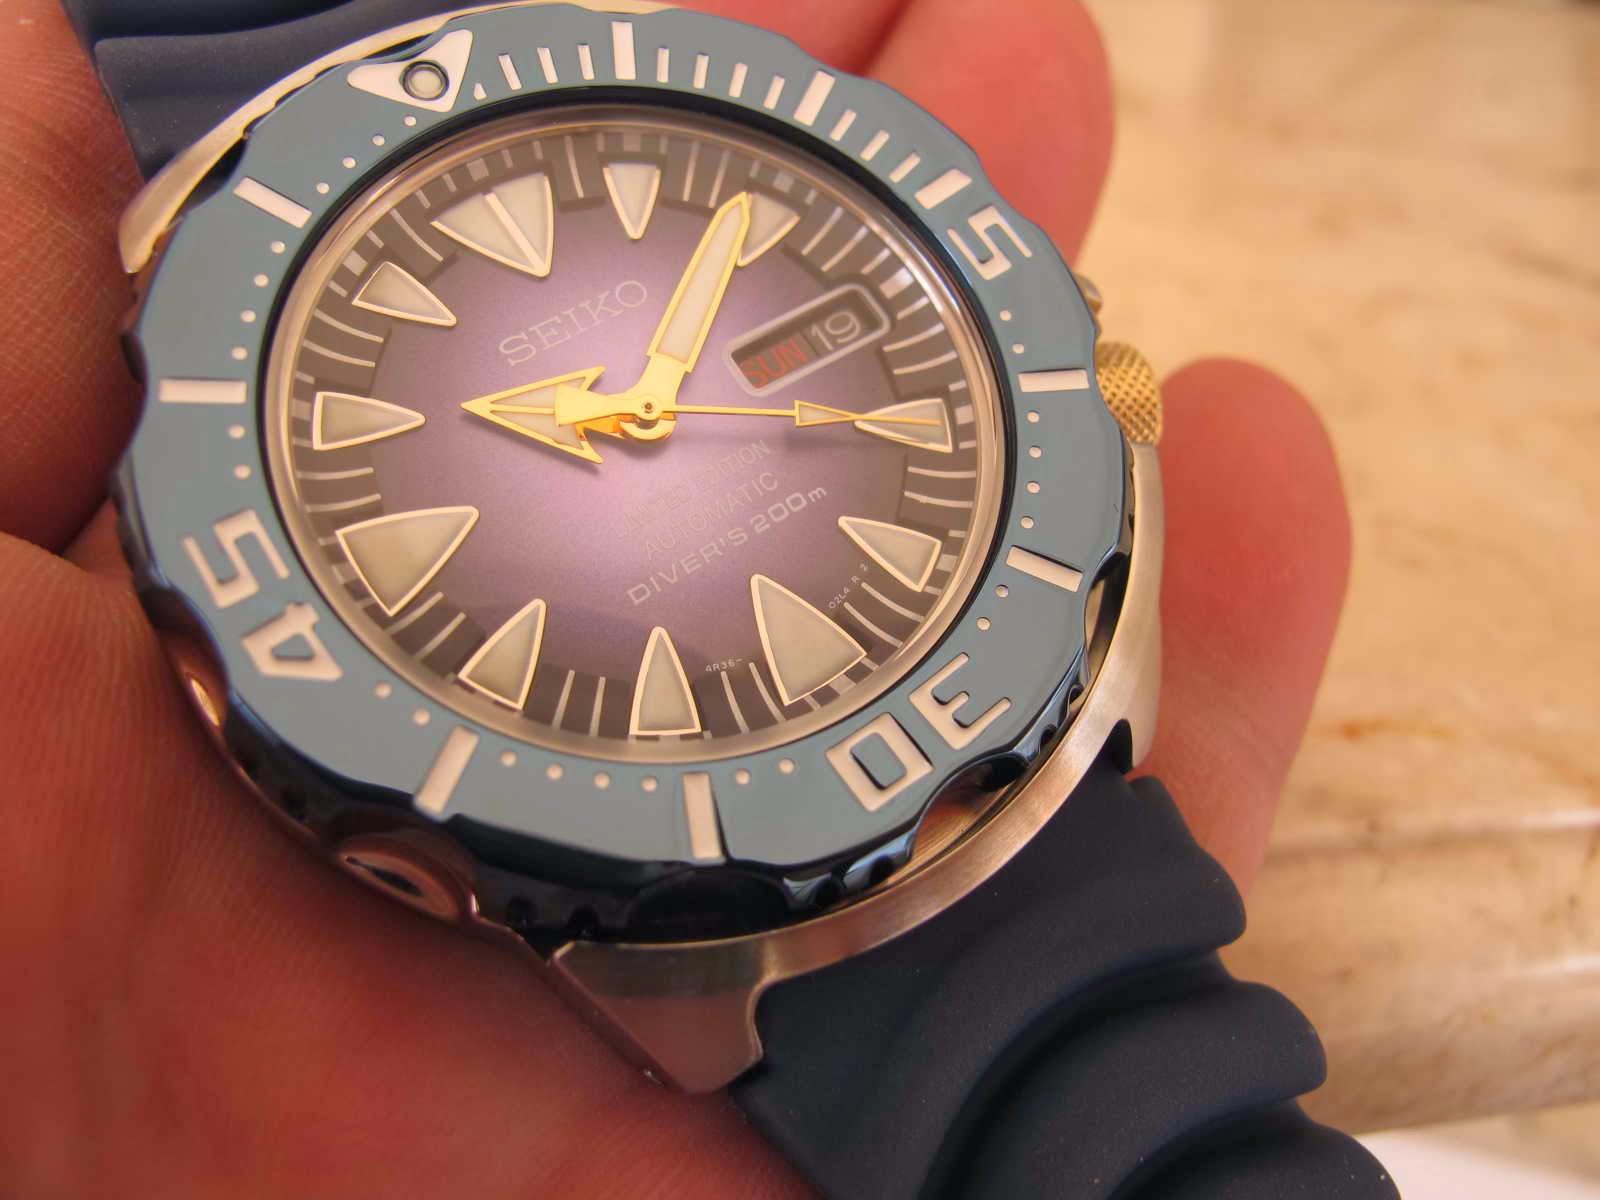 Harga Jual Jam Tangan Seiko Limited Edition 200000 5 Sports Expedition E6673 Ss Grey Brown Original Tebal Case 13 Mm Dan Lebar Lug 20 Kondisi Monster Blue Dial Srp455 Ini Brand